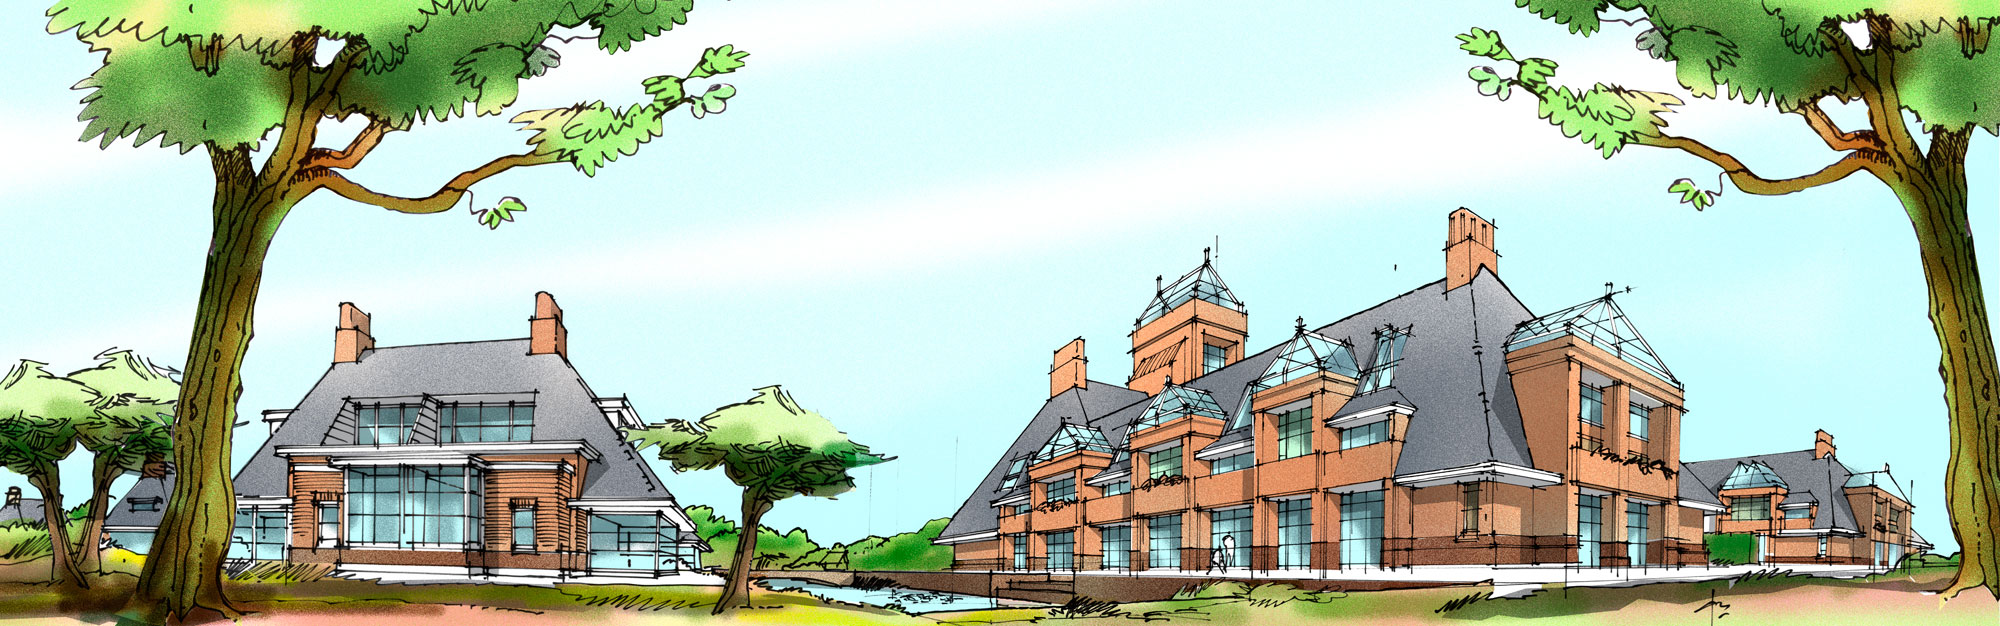 Concept visie hotel en groepsaccomodatie